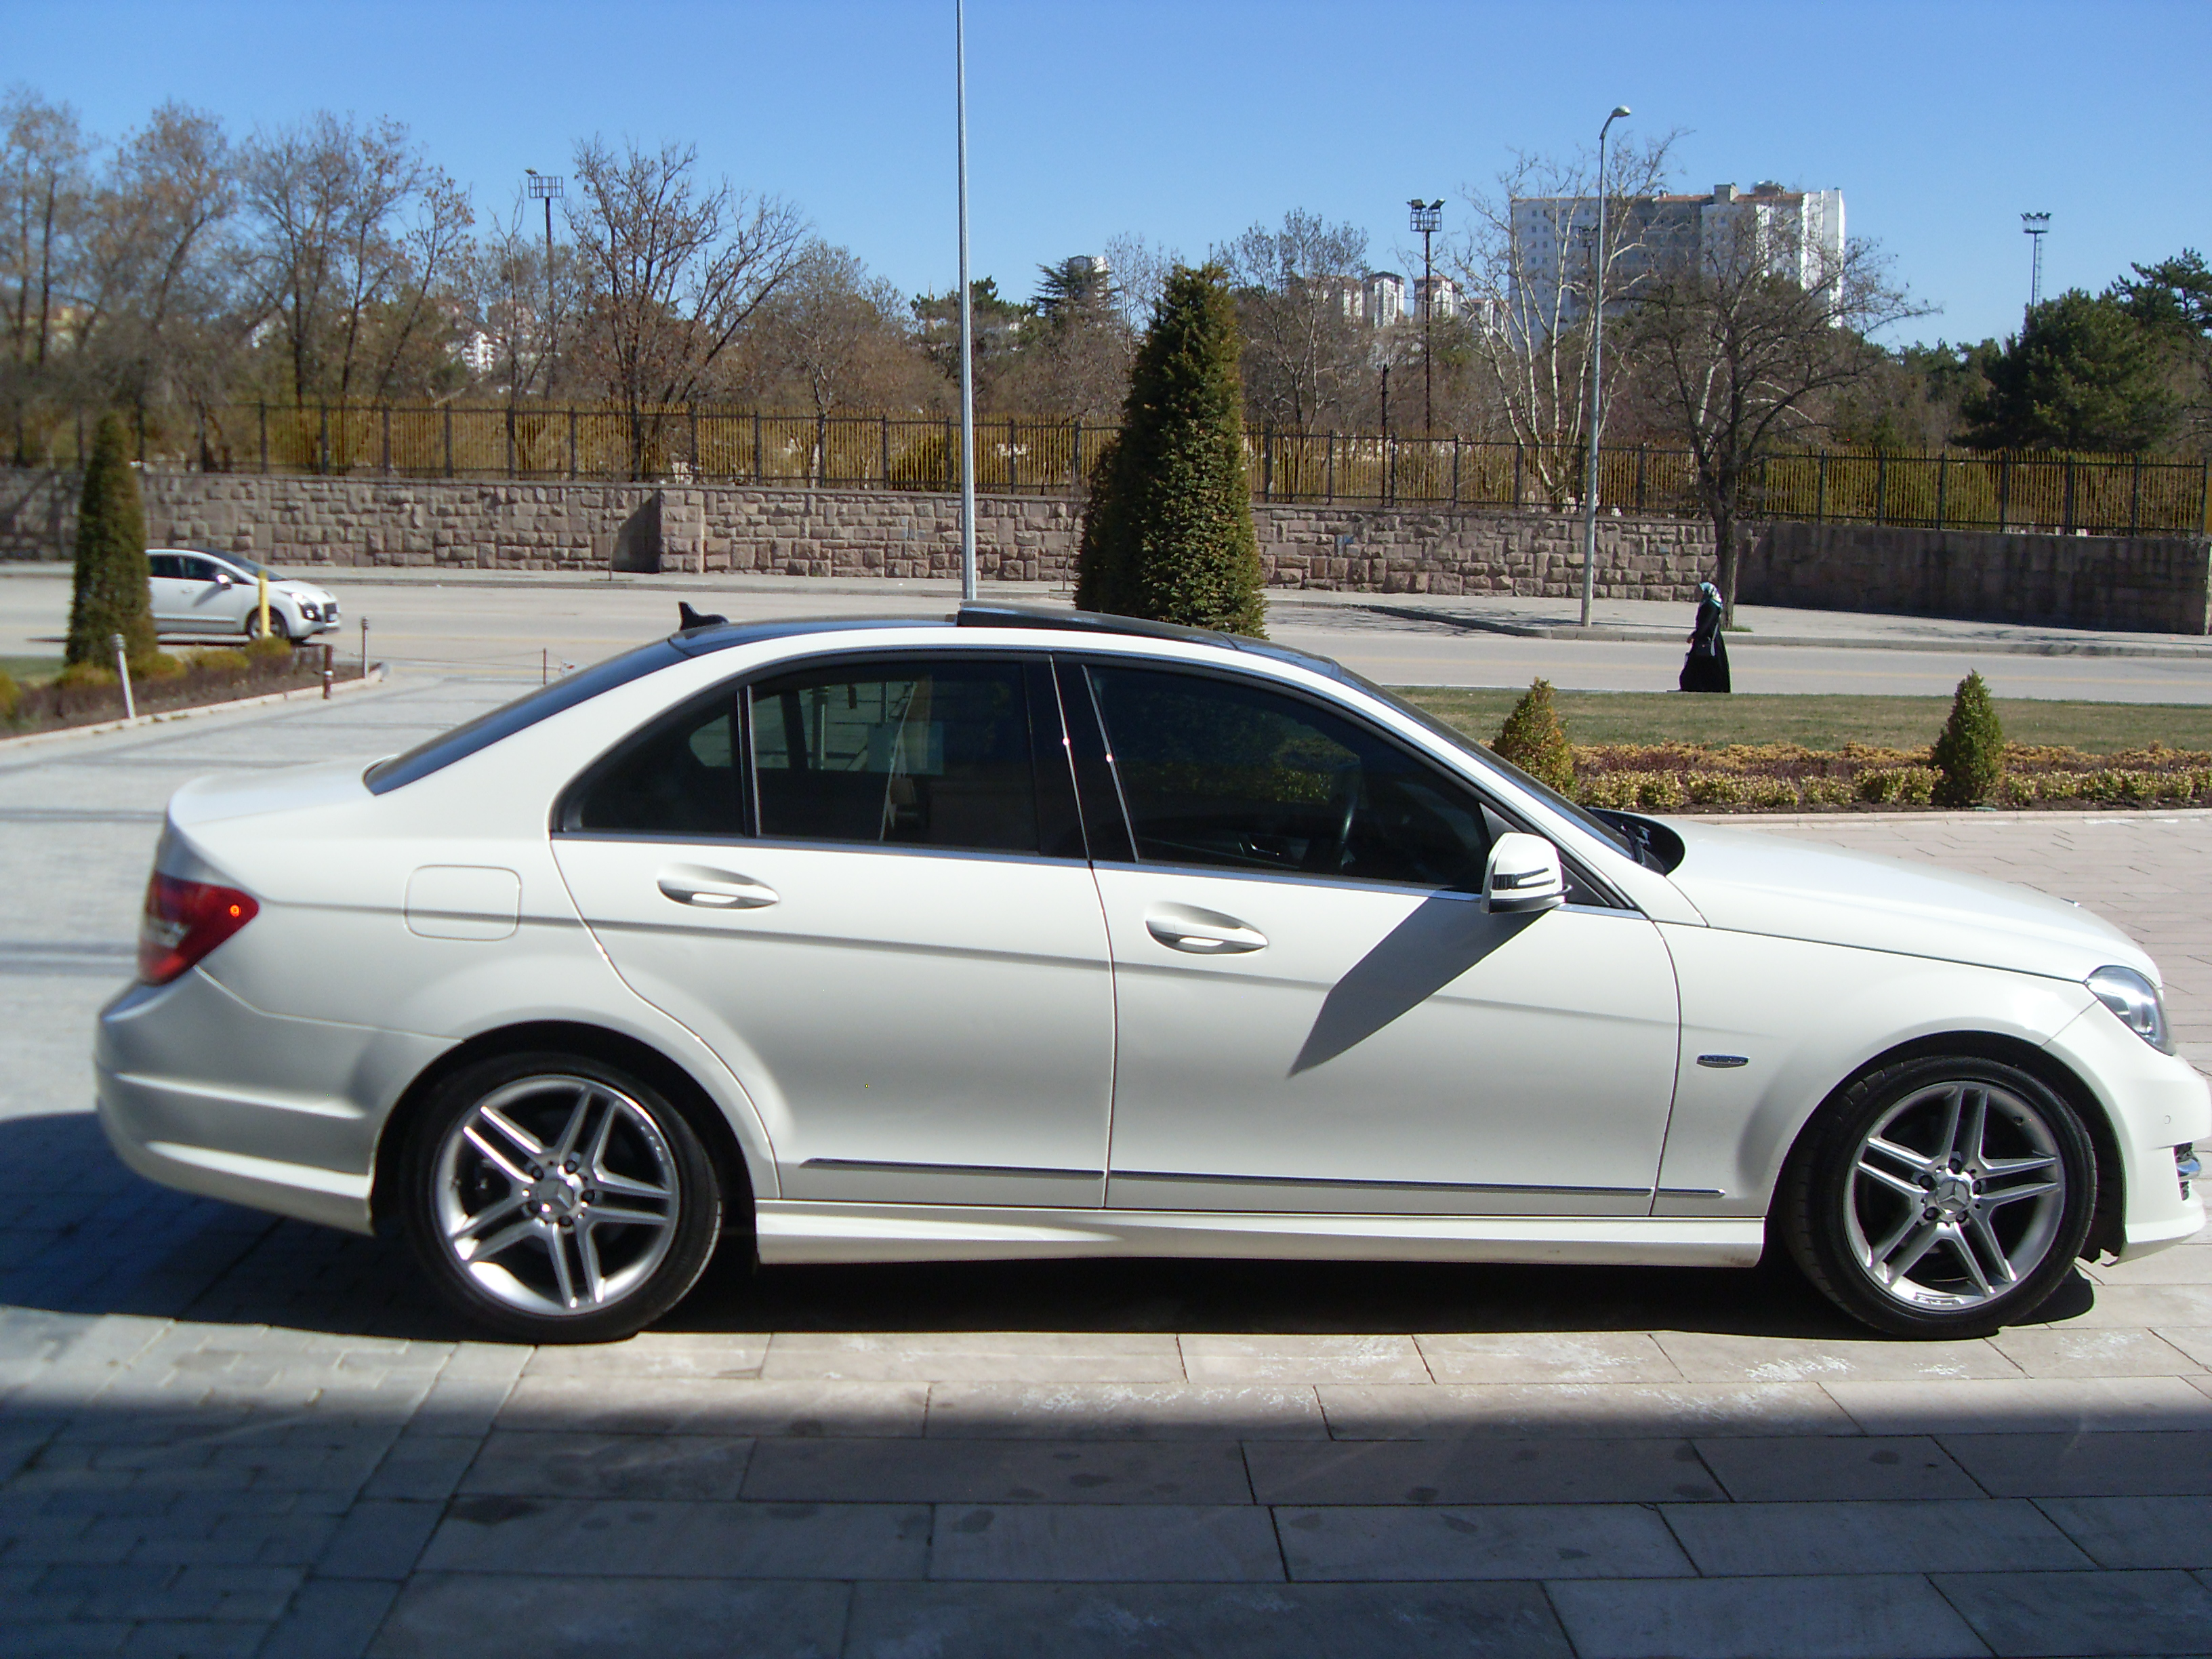 Mercedes benz c180 nceleme w204 cars of turkey for Mercedes benz turkey